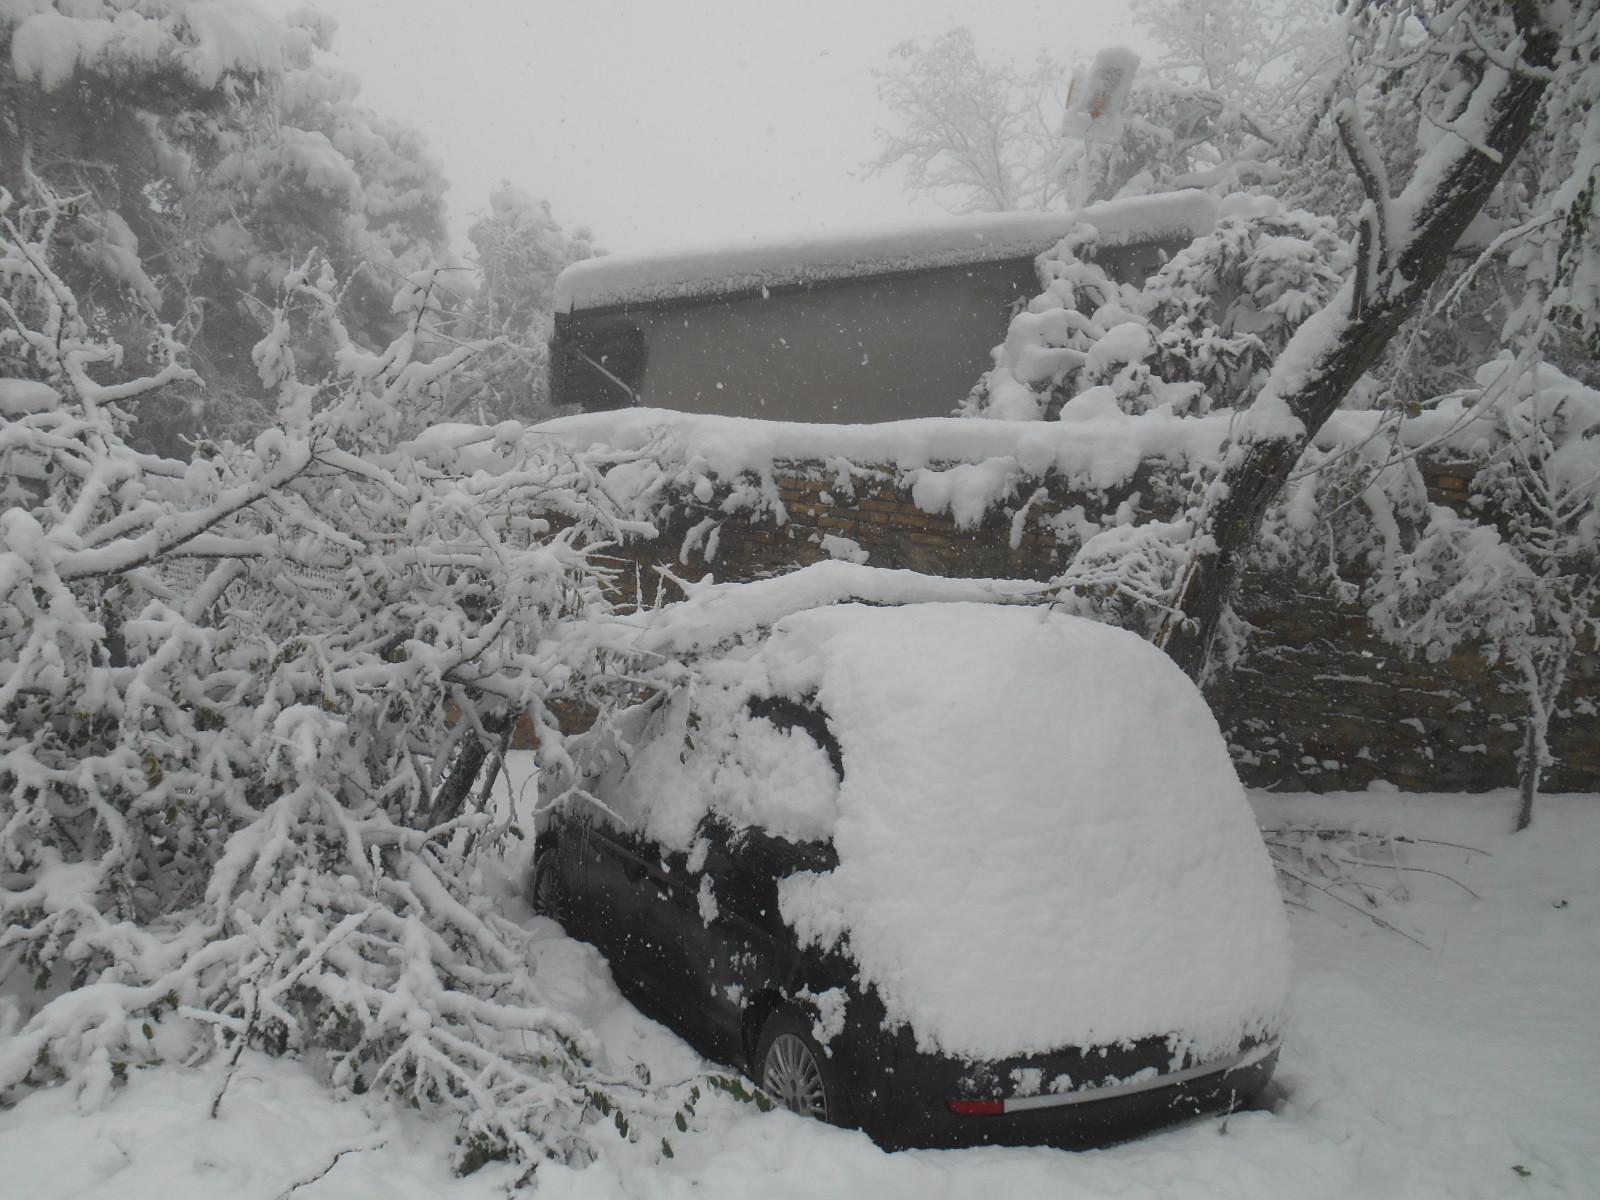 Neve a Ripatransone, 27 novembre 2013 3